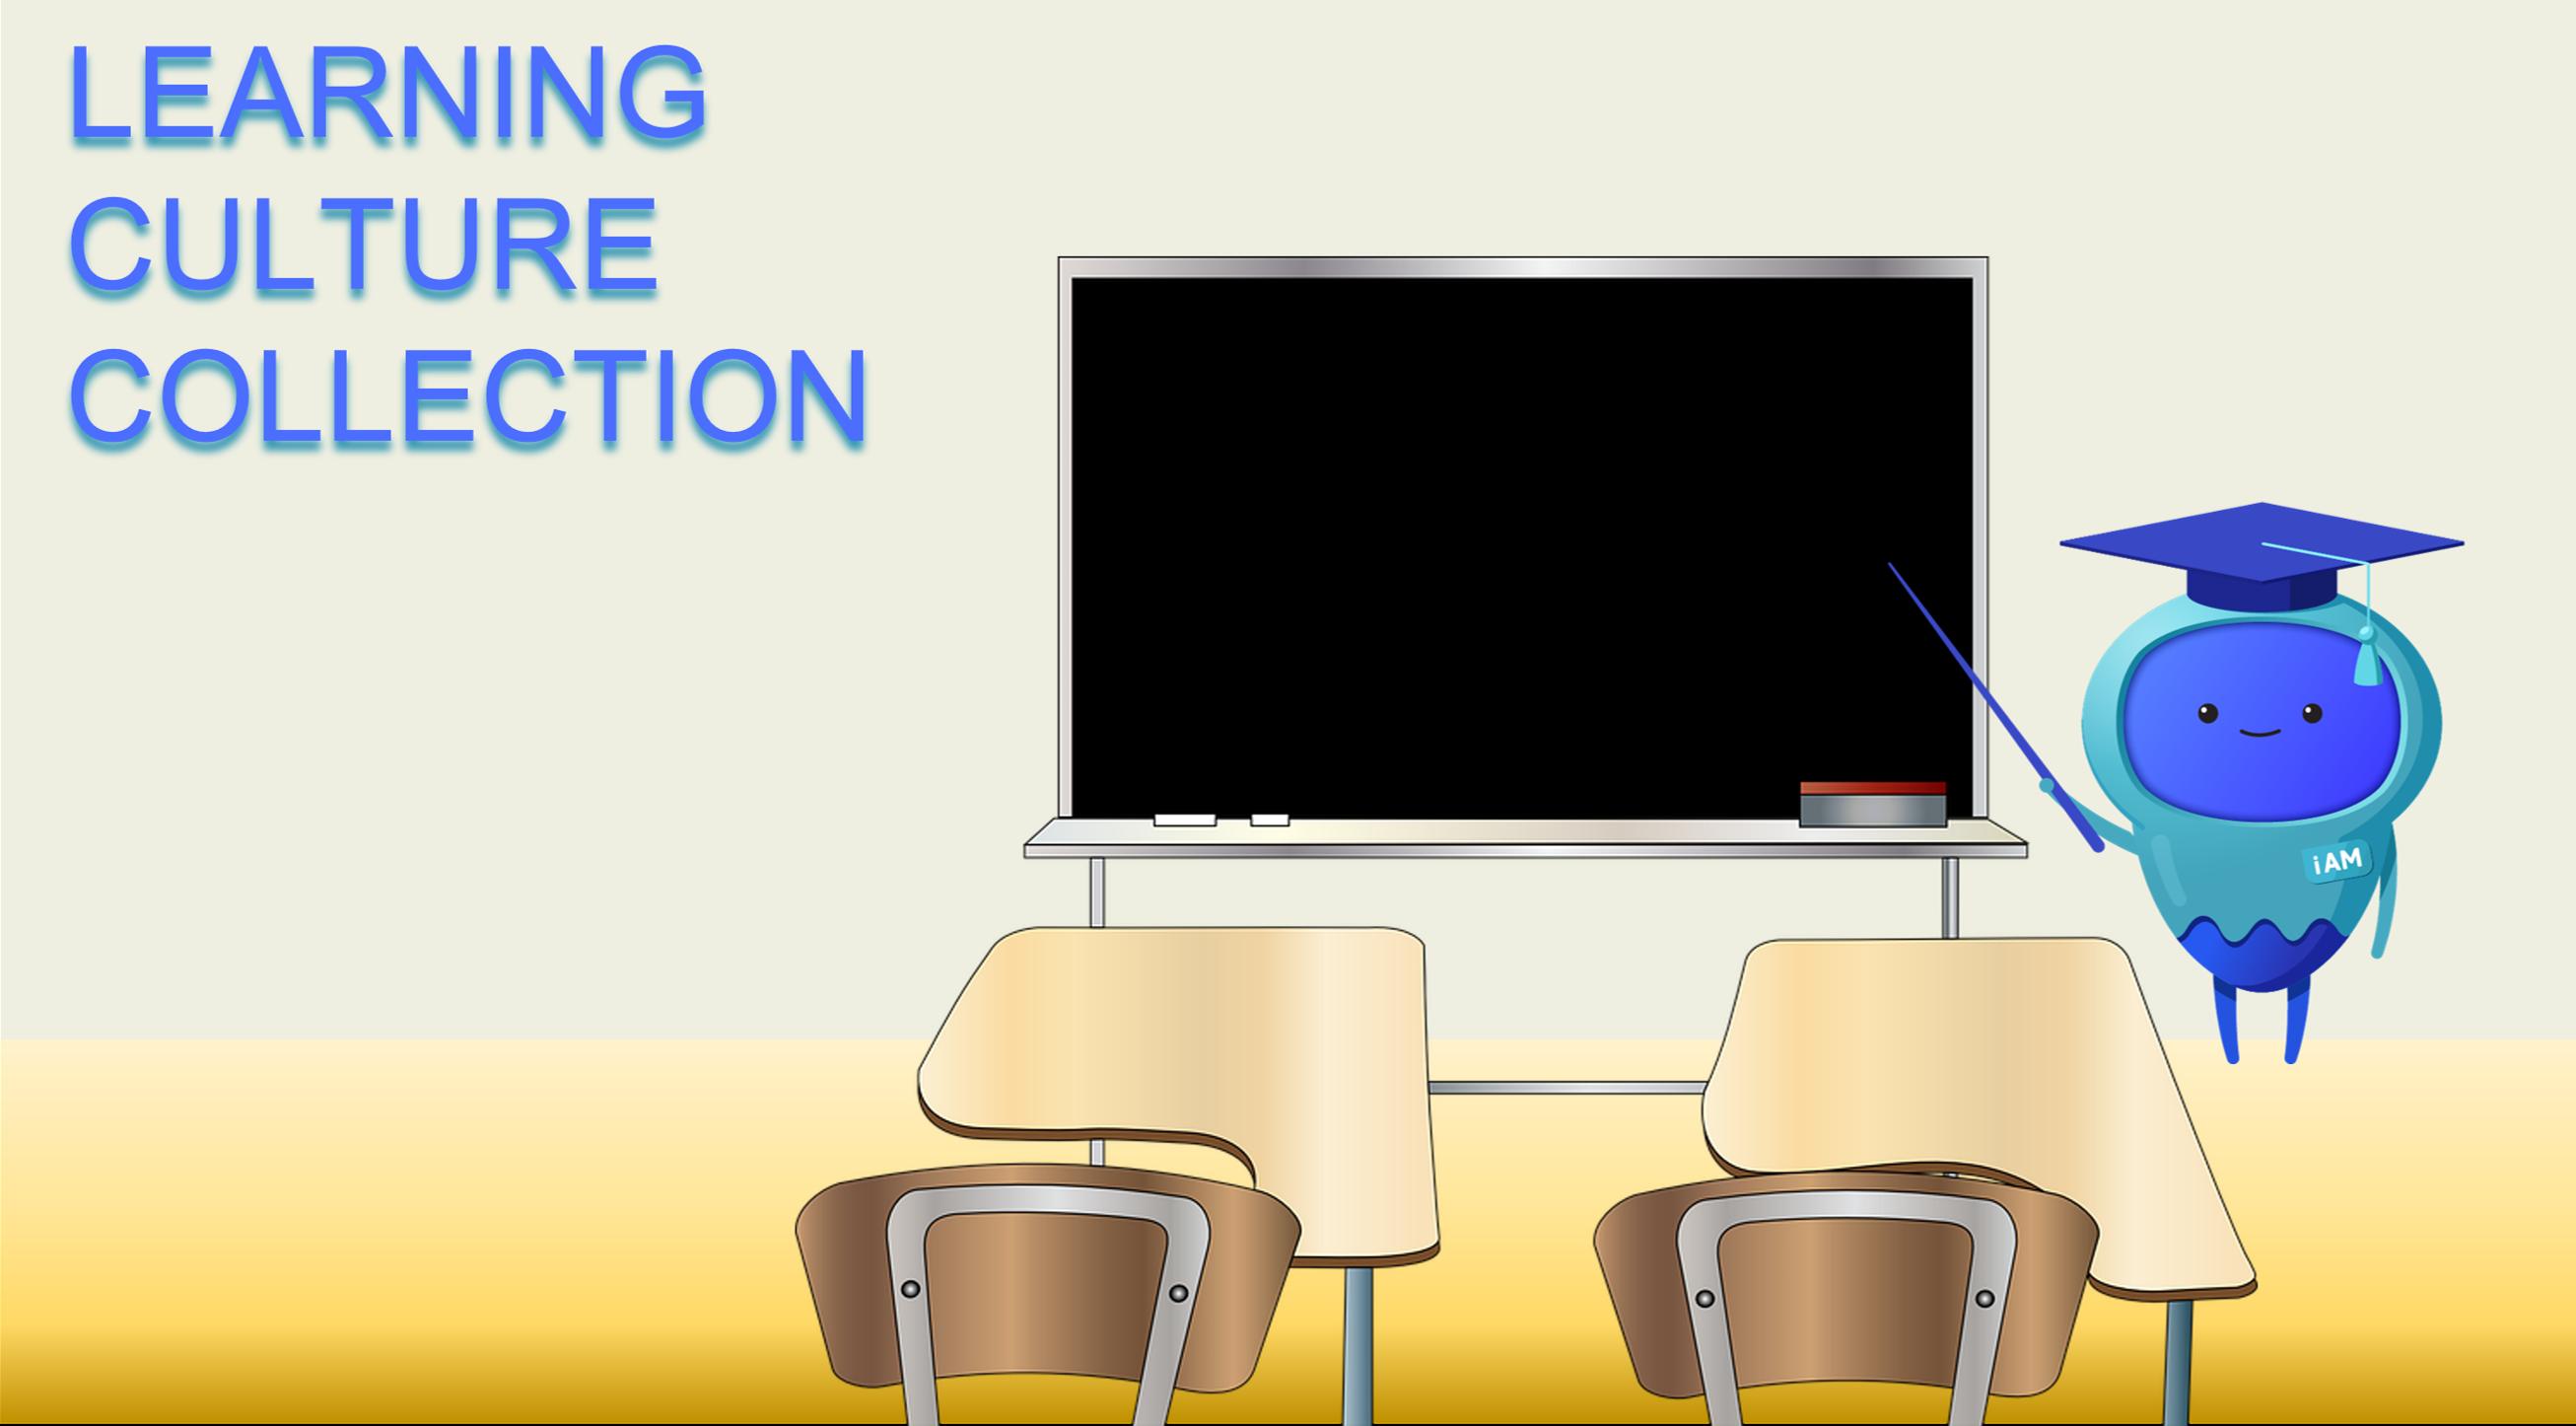 Establishing a Learning Culture